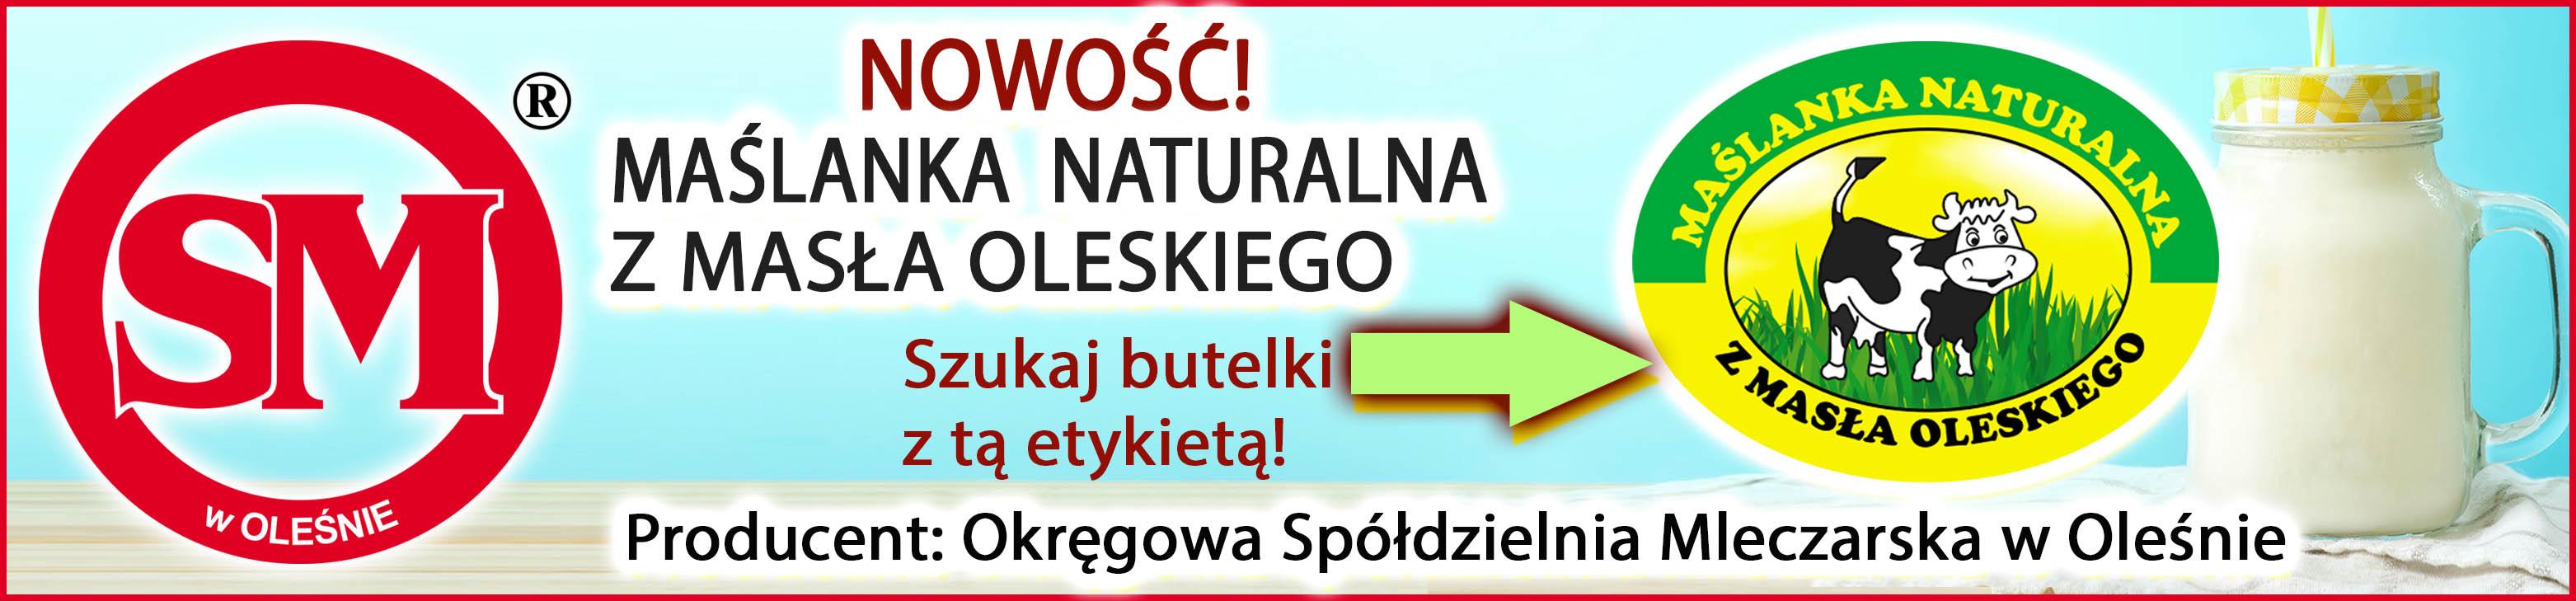 OSM_maslanka